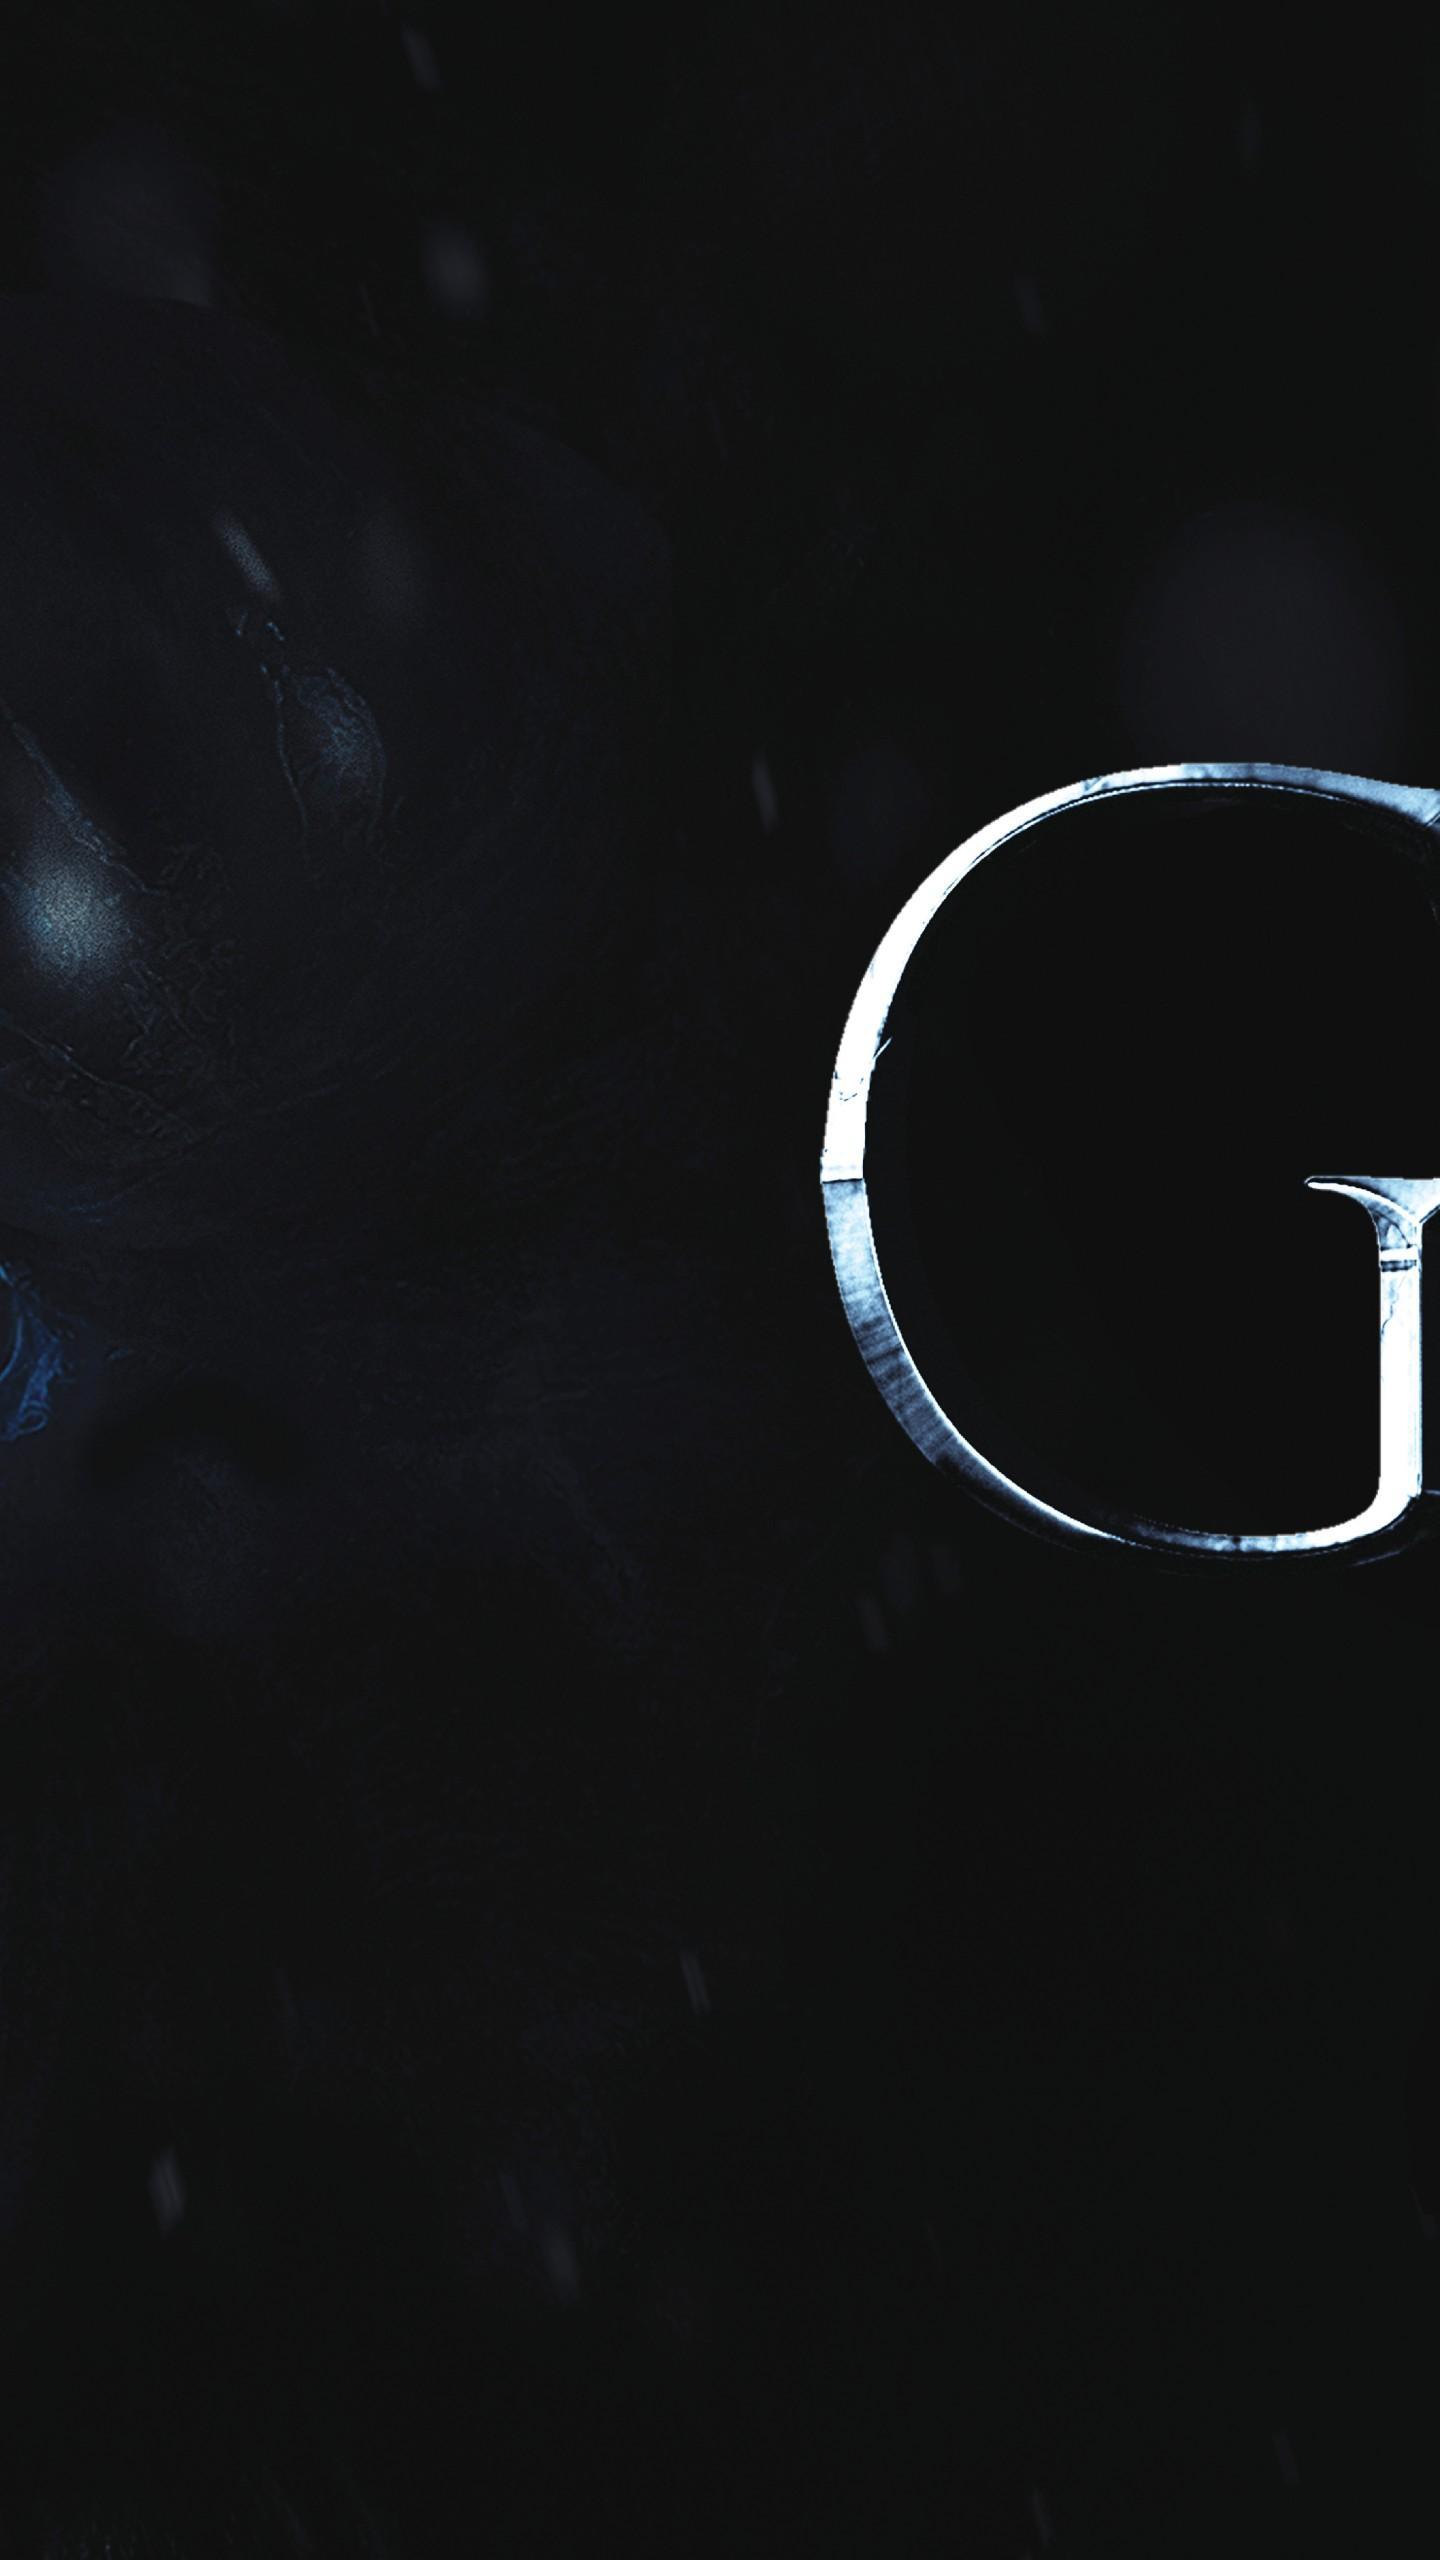 Game Of Thrones Movie 4k